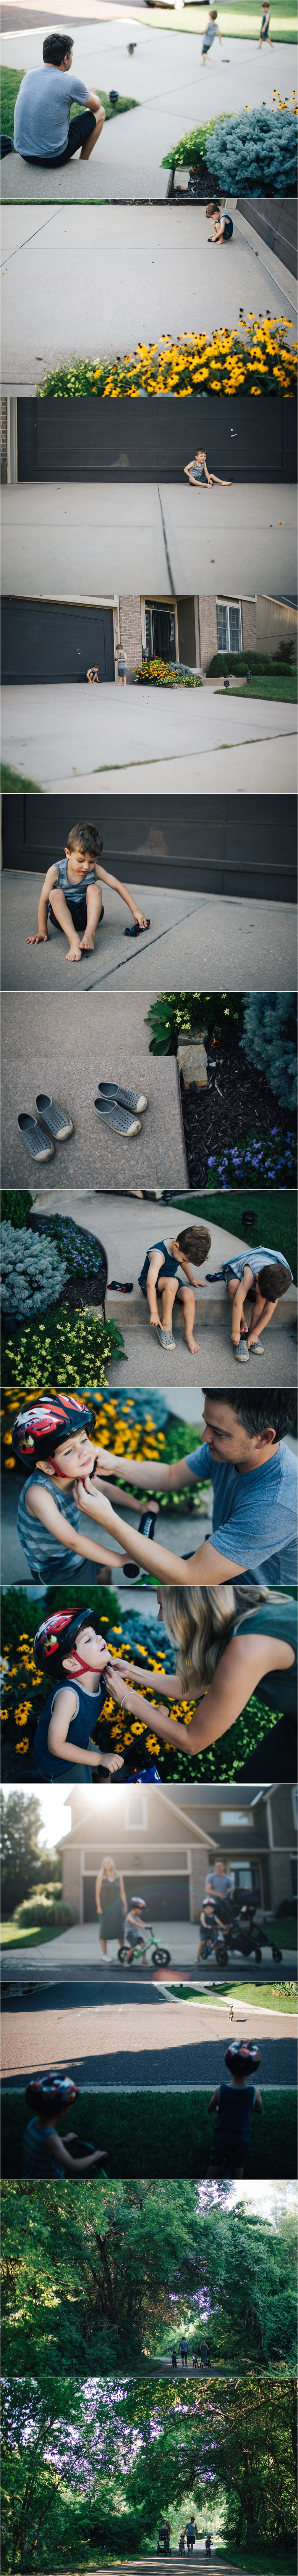 kansascityfamilyphotographer_0008-1